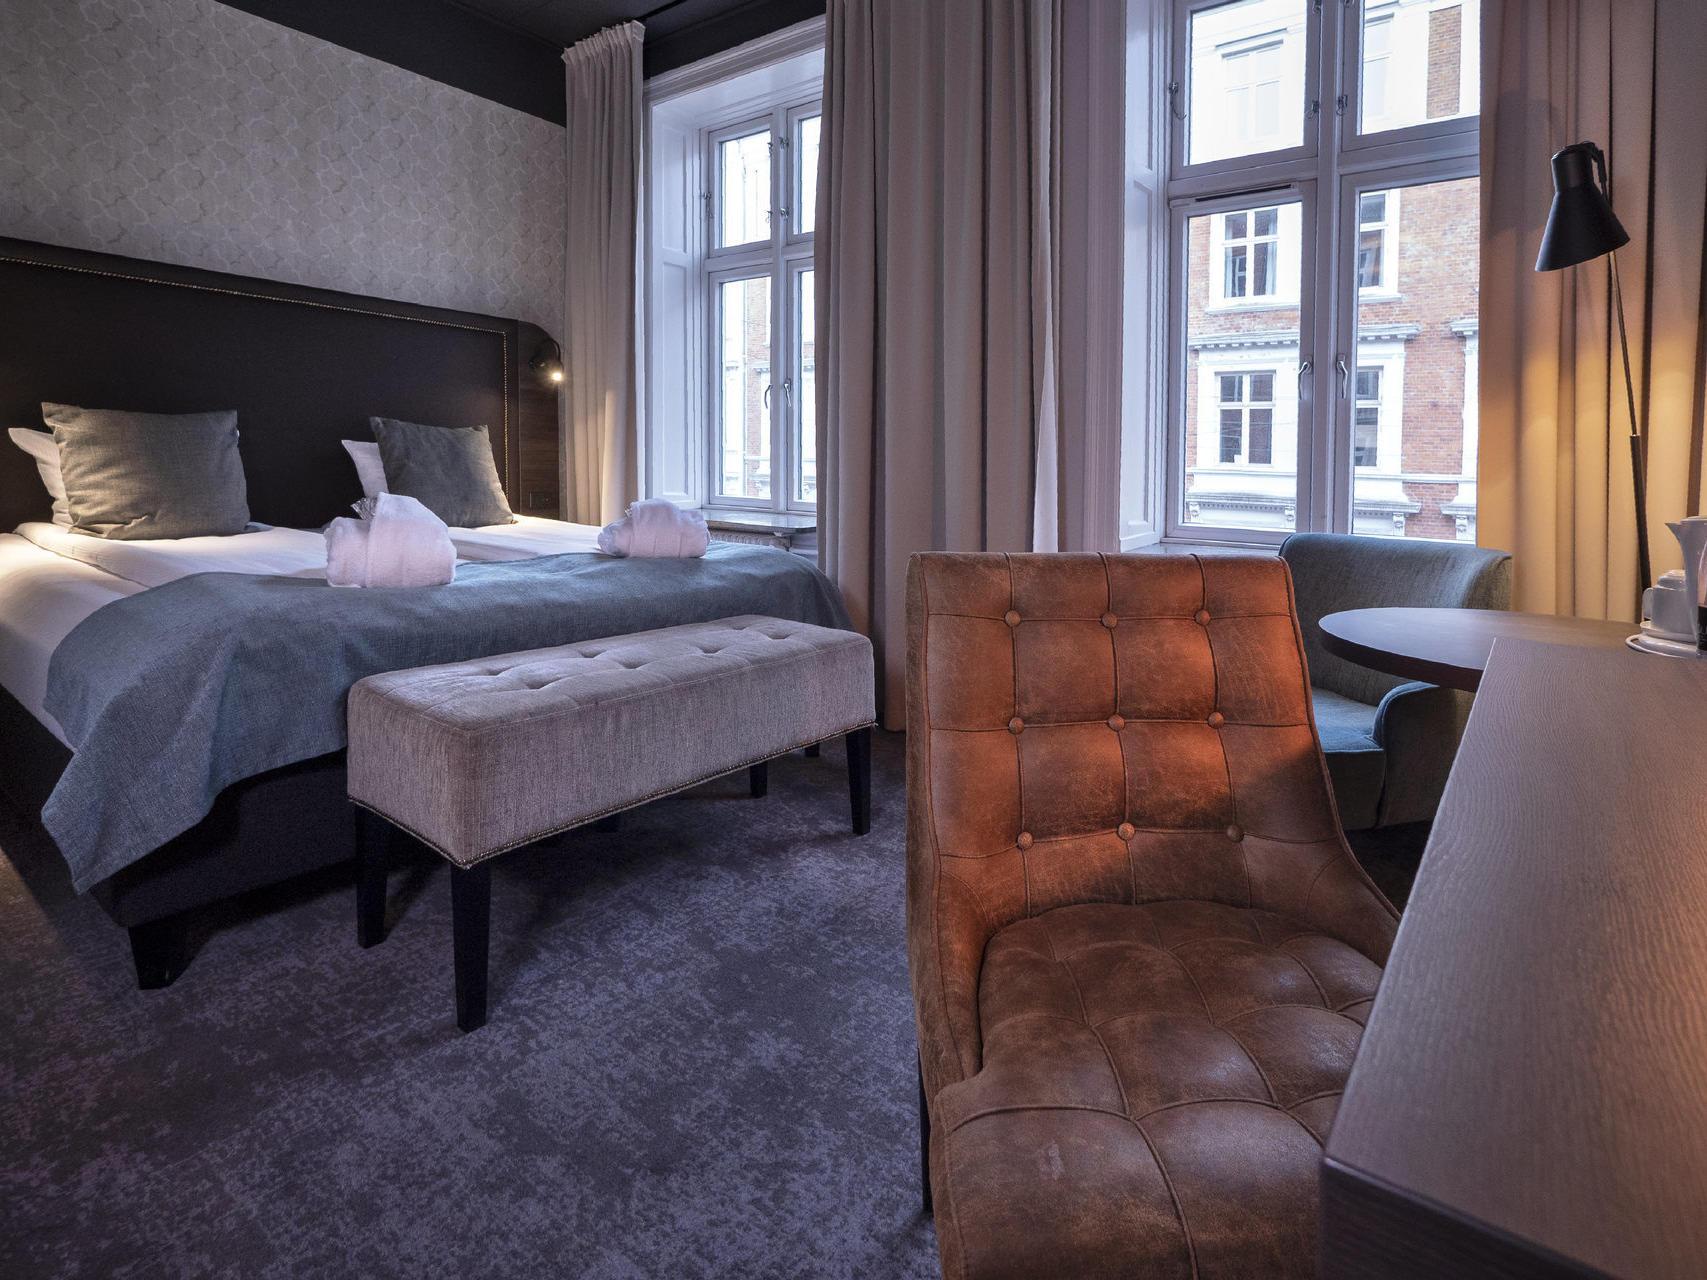 Superior Double Room at Hotel Mayfair Copenhagen